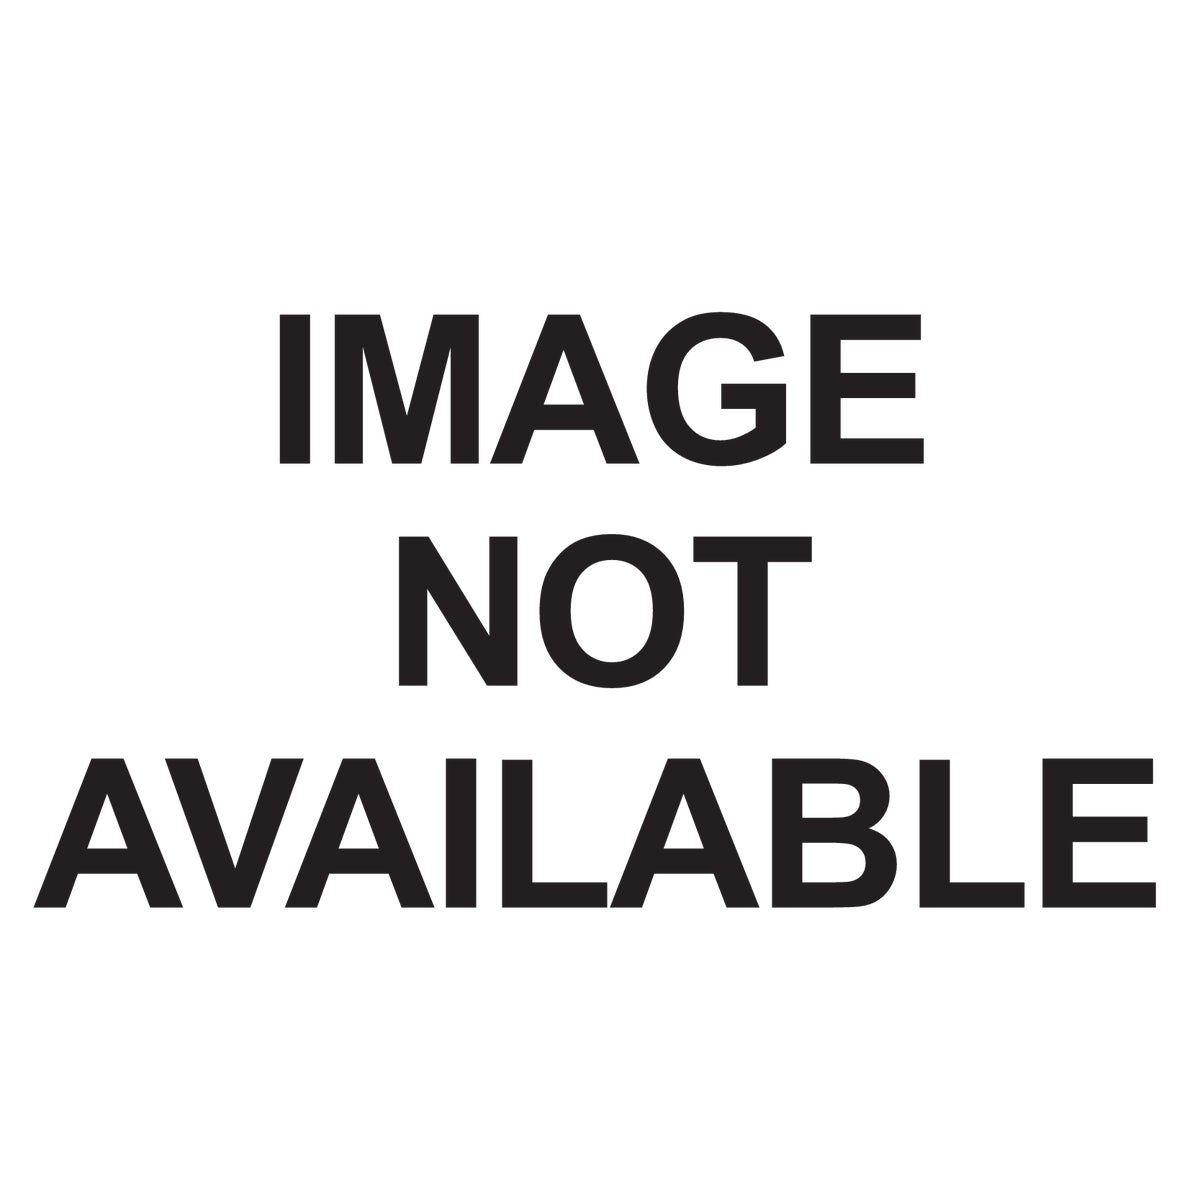 "12"" CABARET CEILING TILE - BTCAB by Bldg Prod Canada Cor"